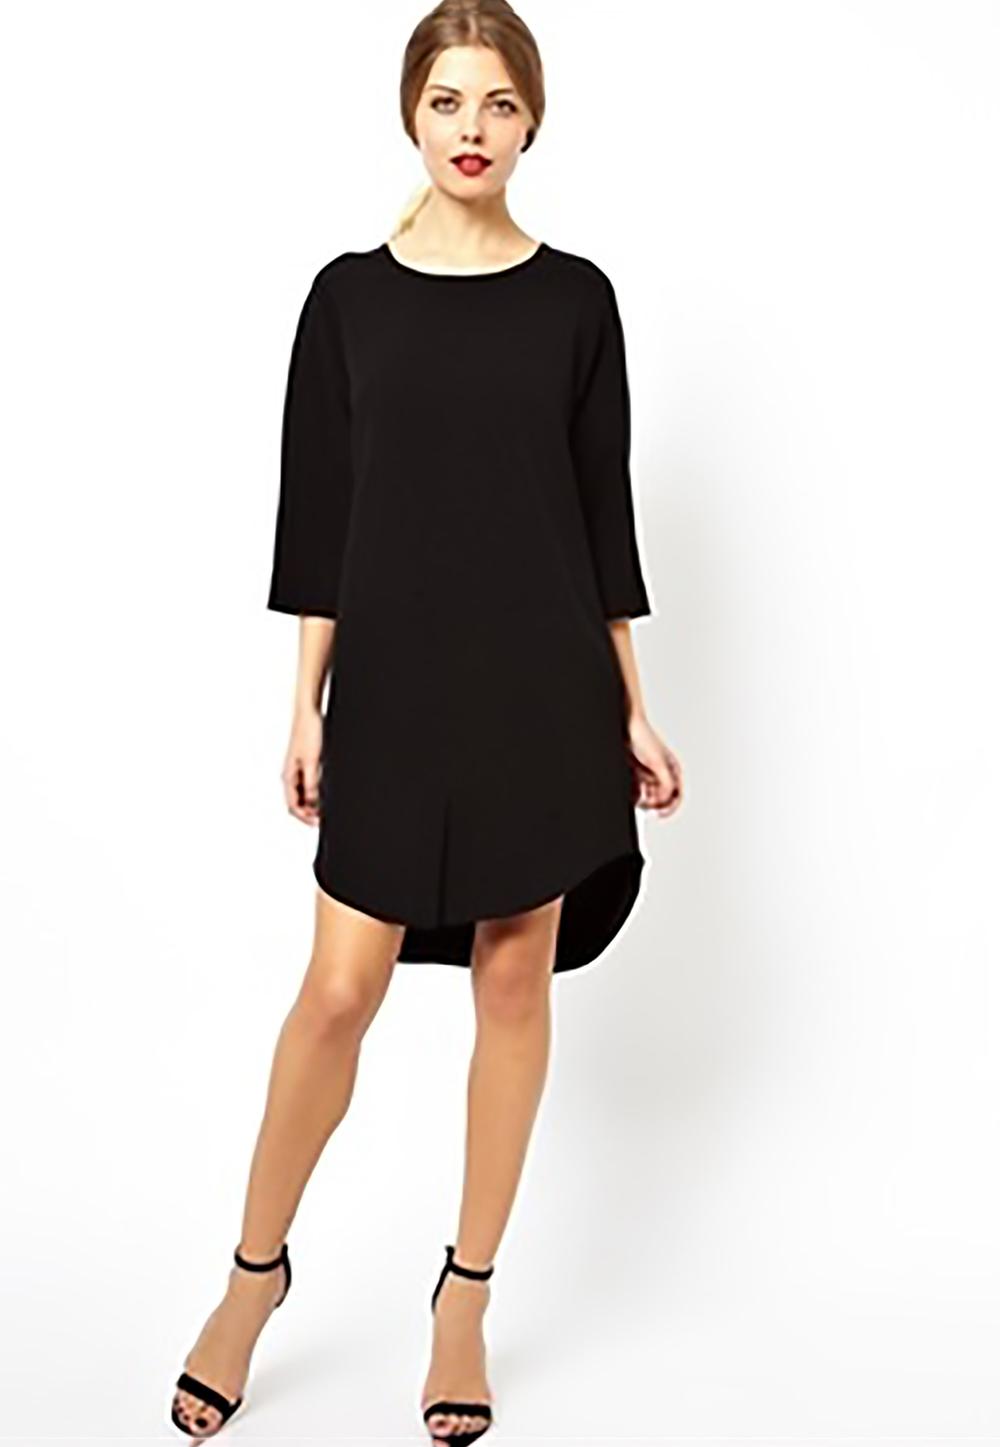 asos clean shift dress short dresses 1500.jpg